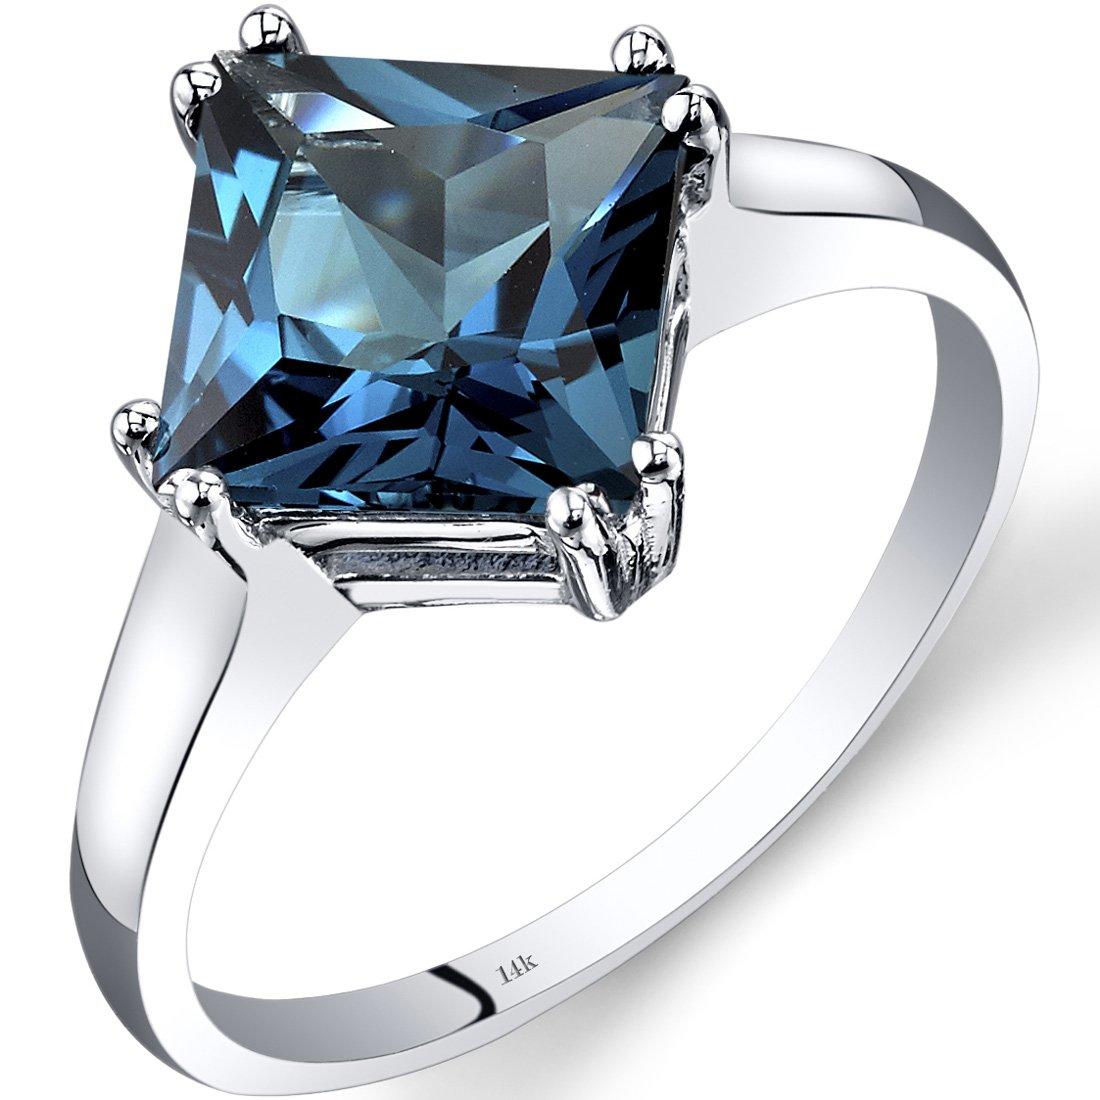 14K White Gold London Blue Topaz Princess Cut Ring 2.75 Carats Size 7